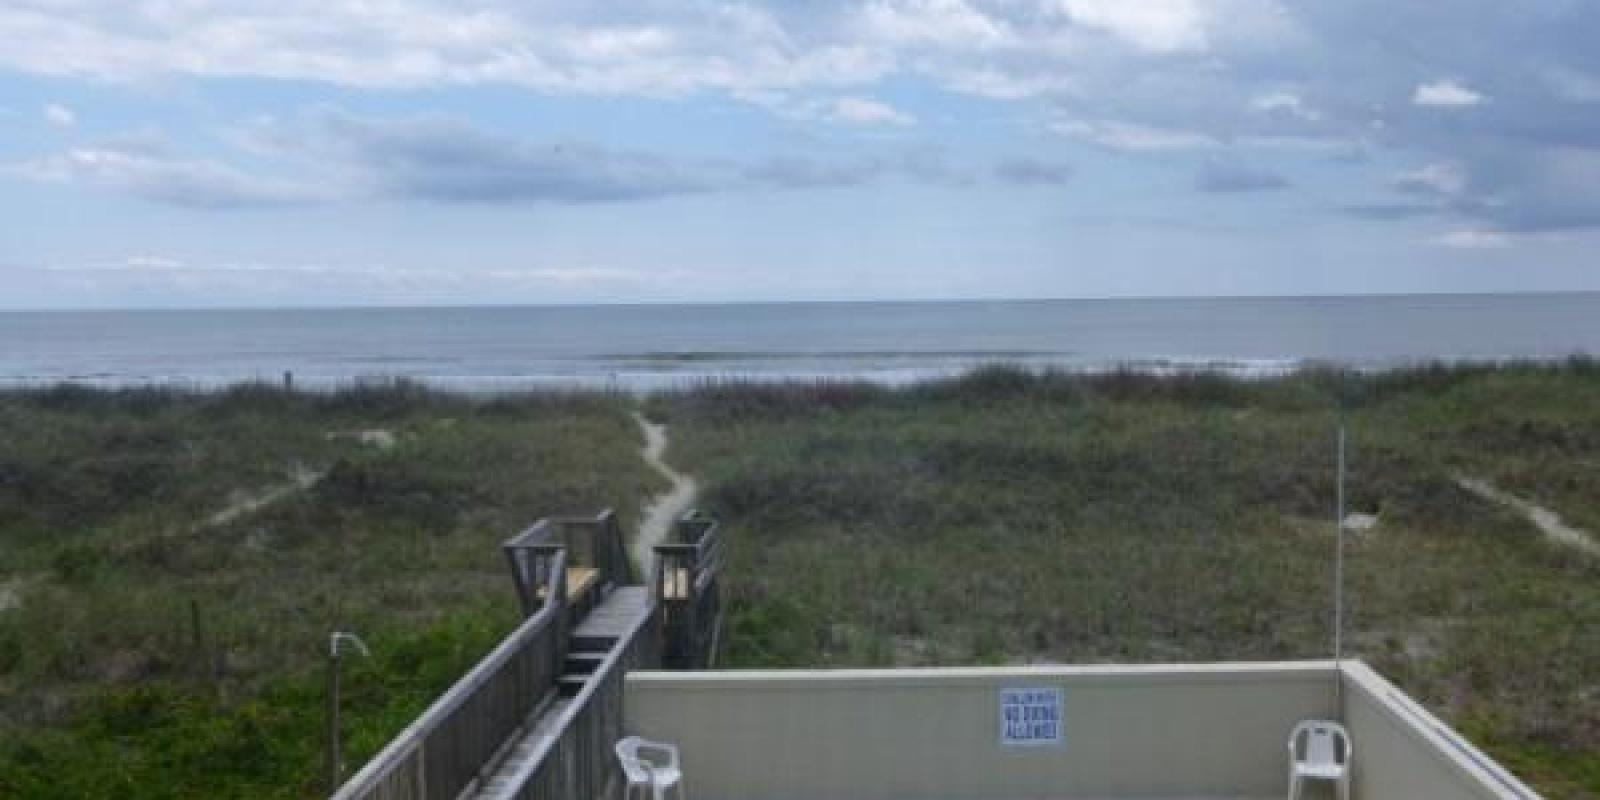 1203 South Ocean Blvd,Myrtle beach,South Carolina,29582,Multifamily,South Ocean Blvd,1063